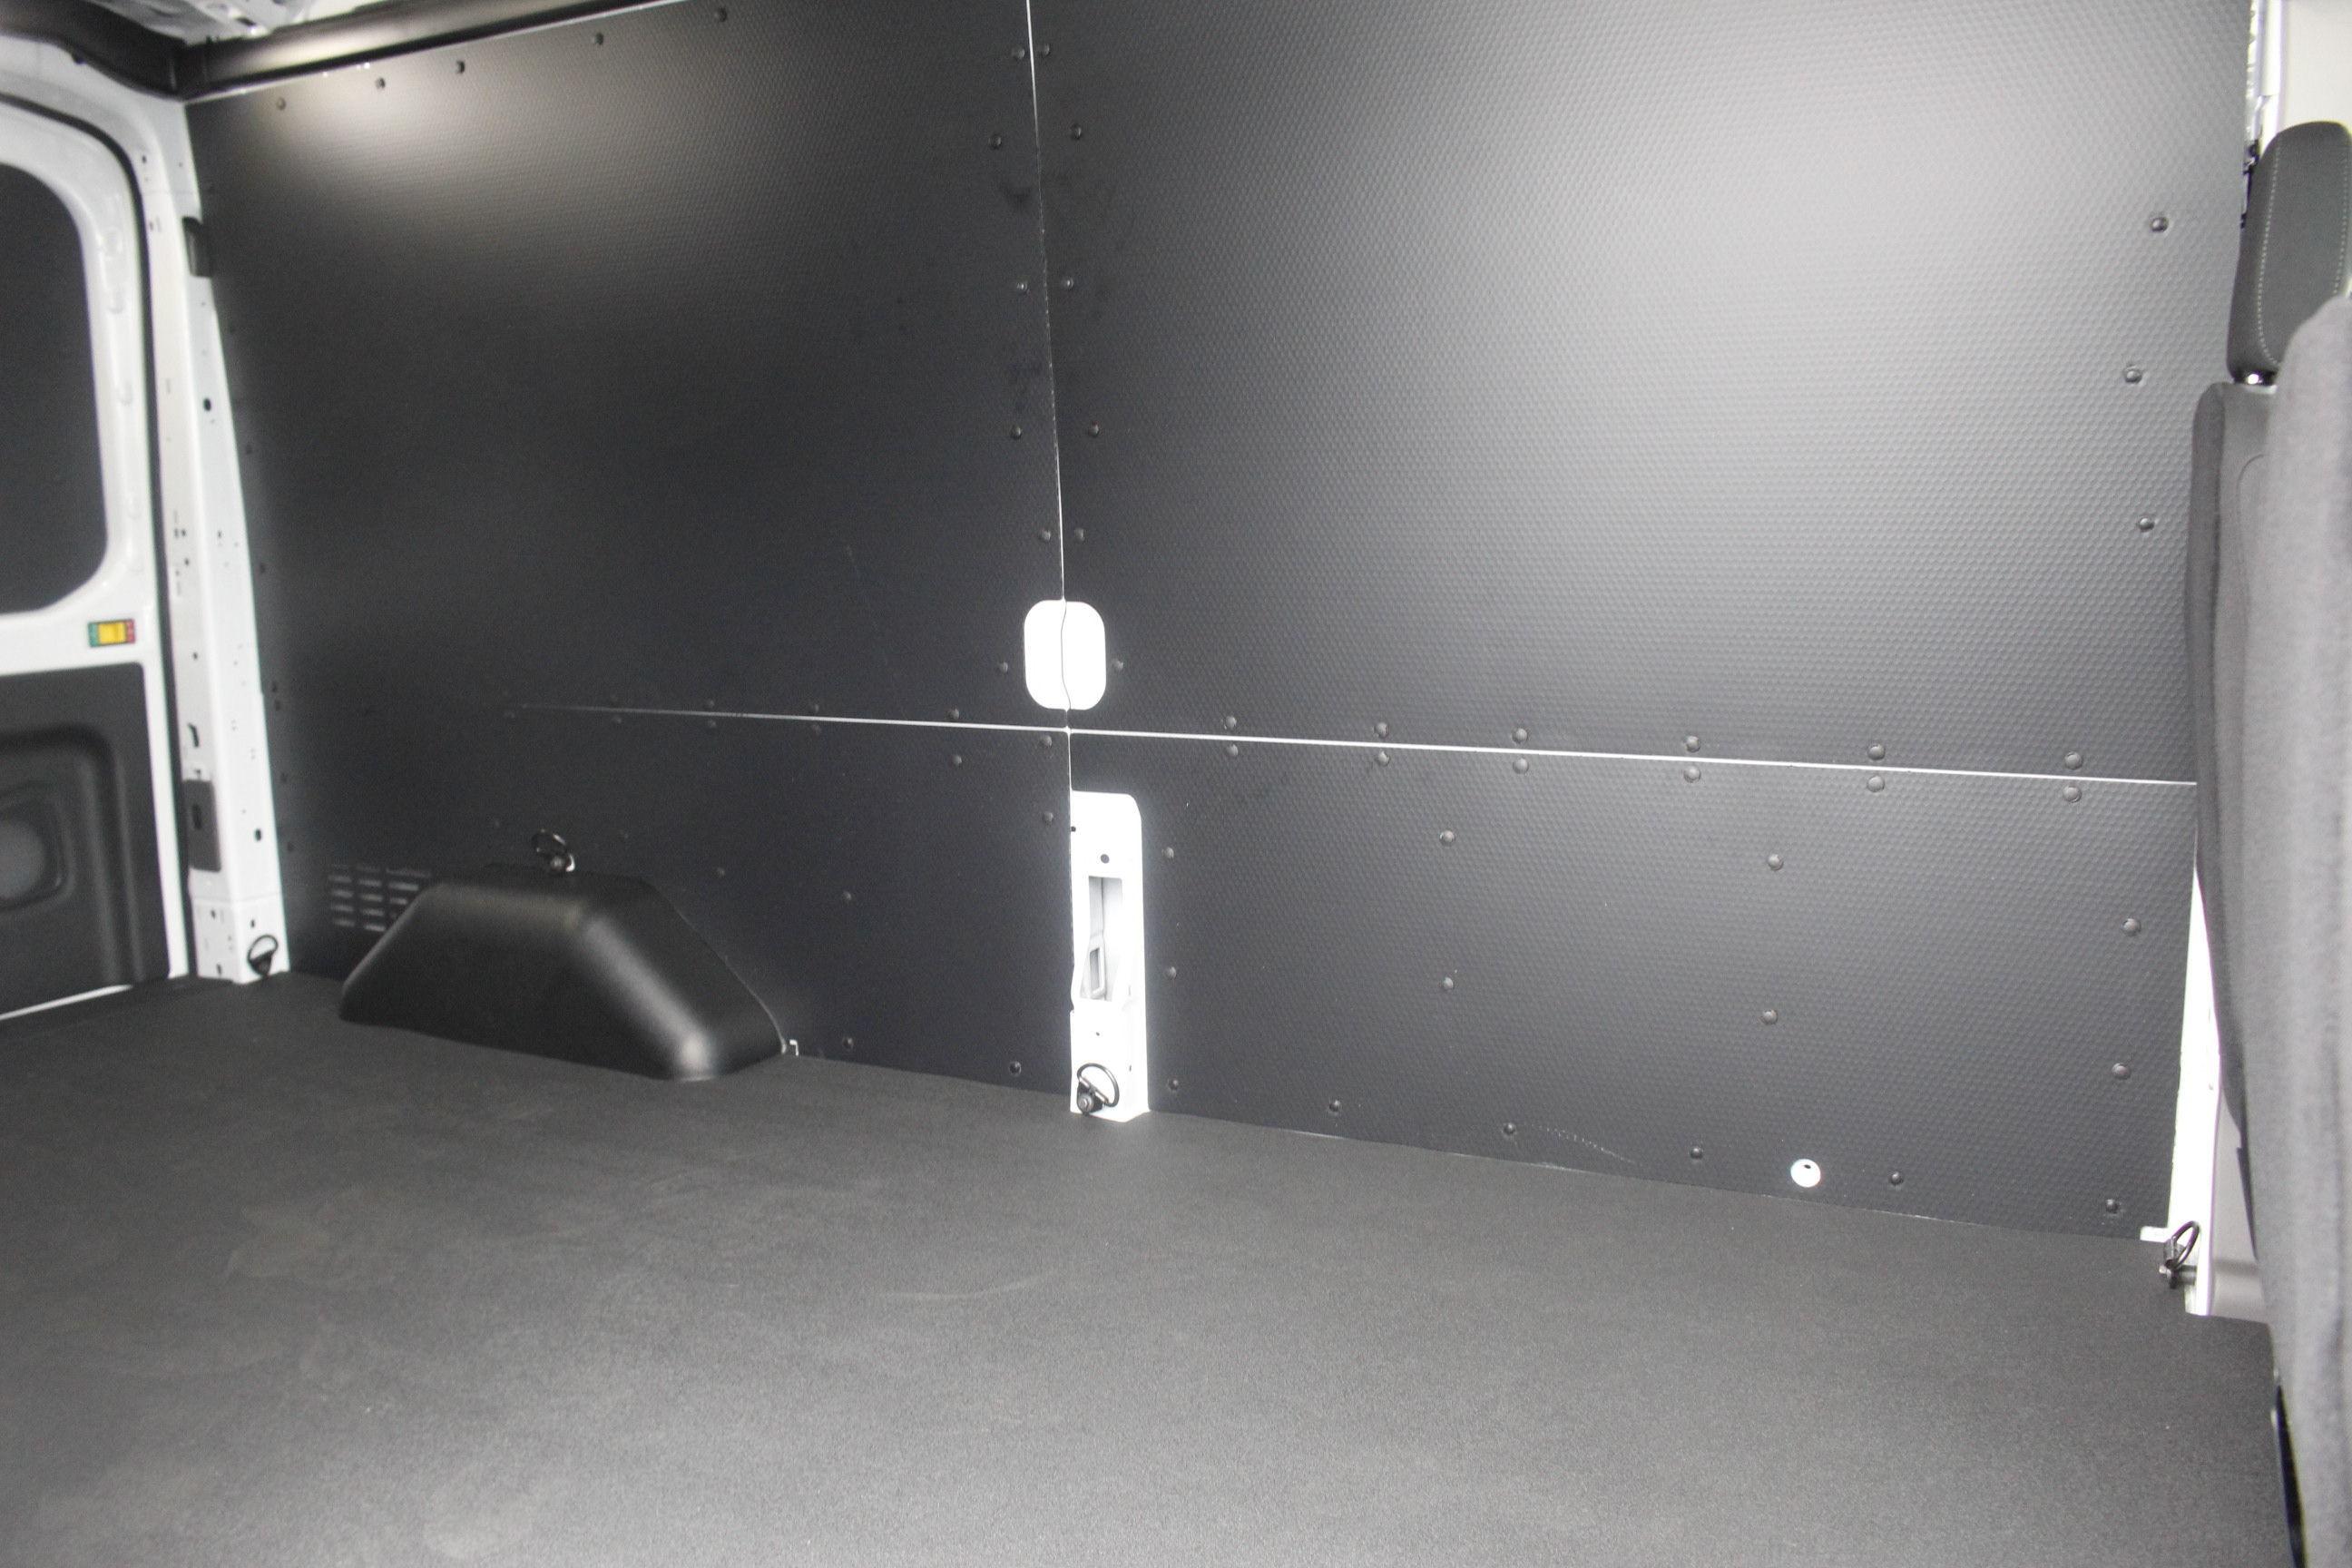 2020 Transit 250 Med Roof RWD, Empty Cargo Van #E9146 - photo 2